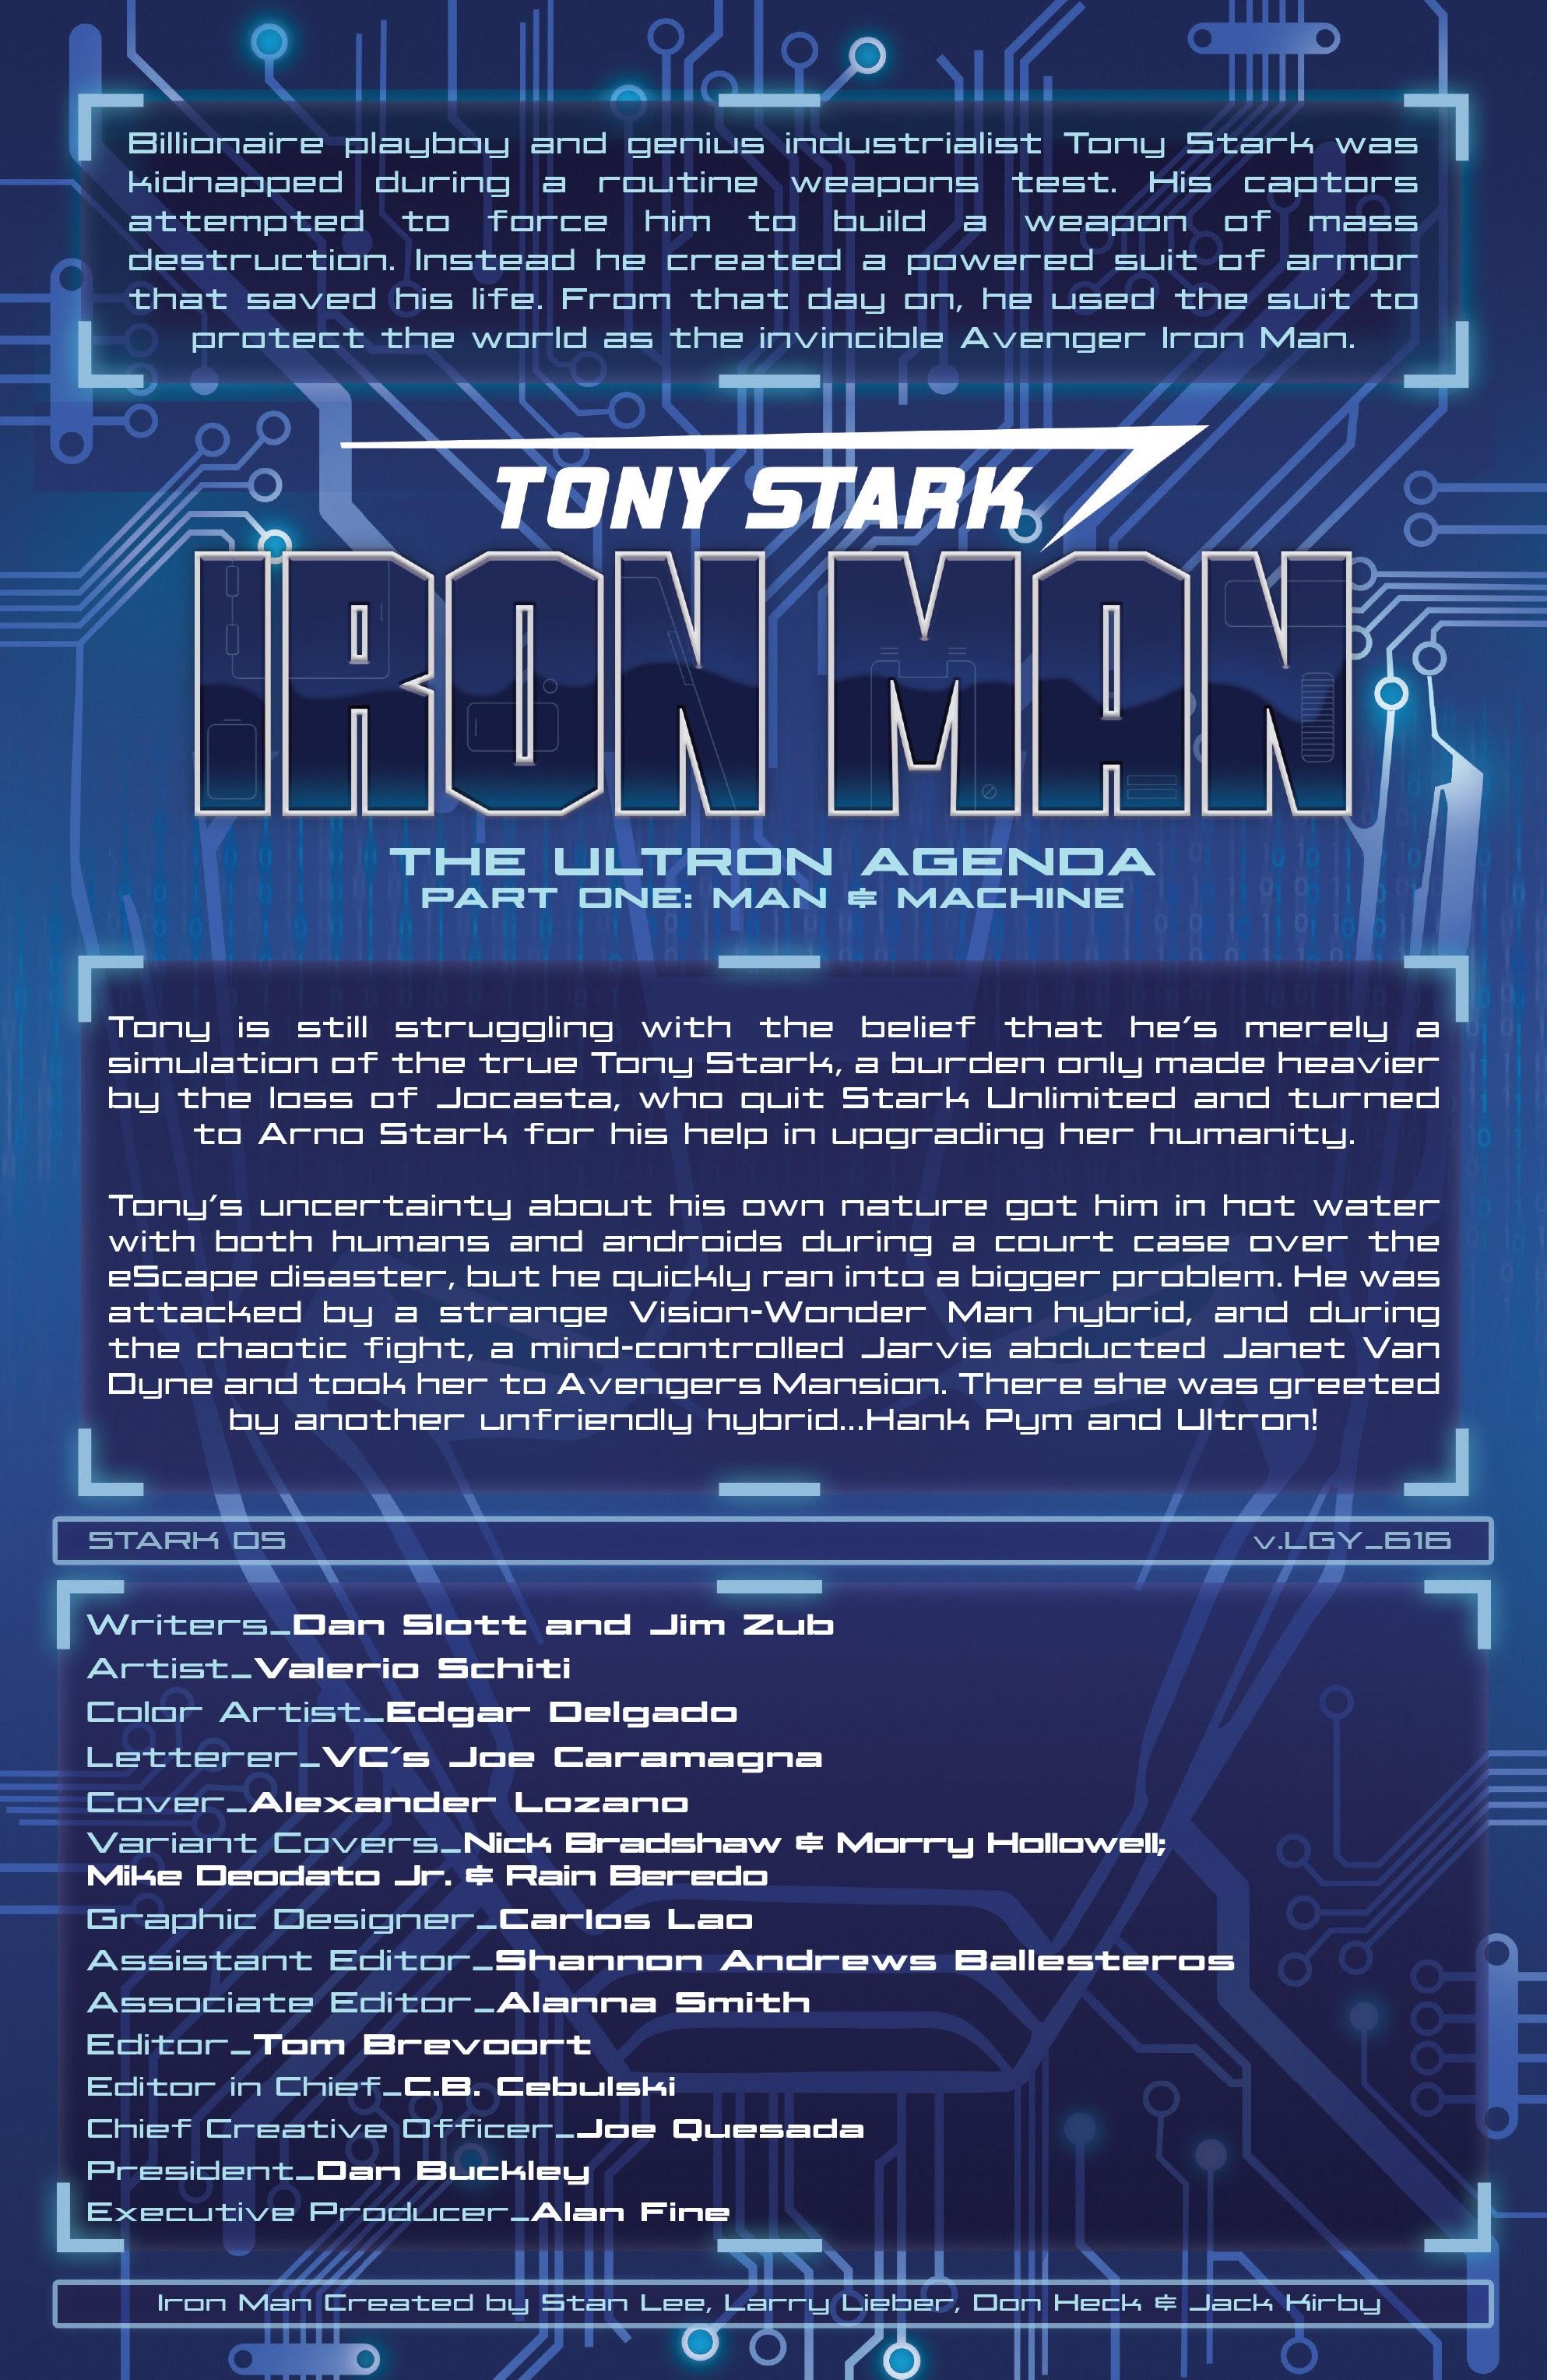 Read online Tony Stark: Iron Man comic -  Issue #16 - 4